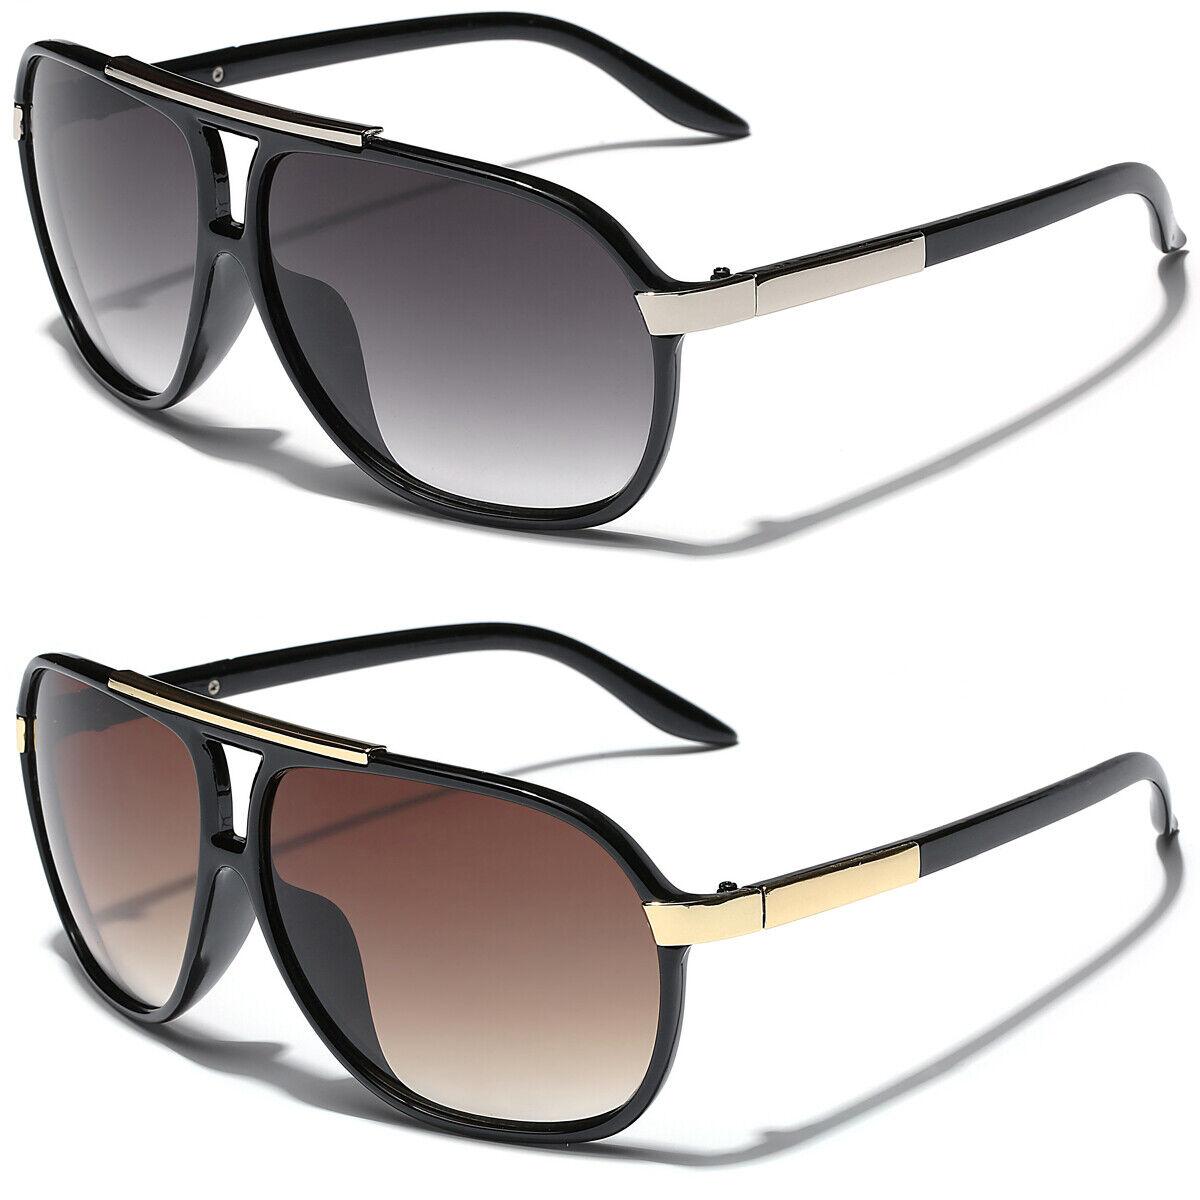 Retro 80s Fashion Aviator Sunglasses Black White Brown Men Women Vintage Glasses Clothing, Shoes & Accessories